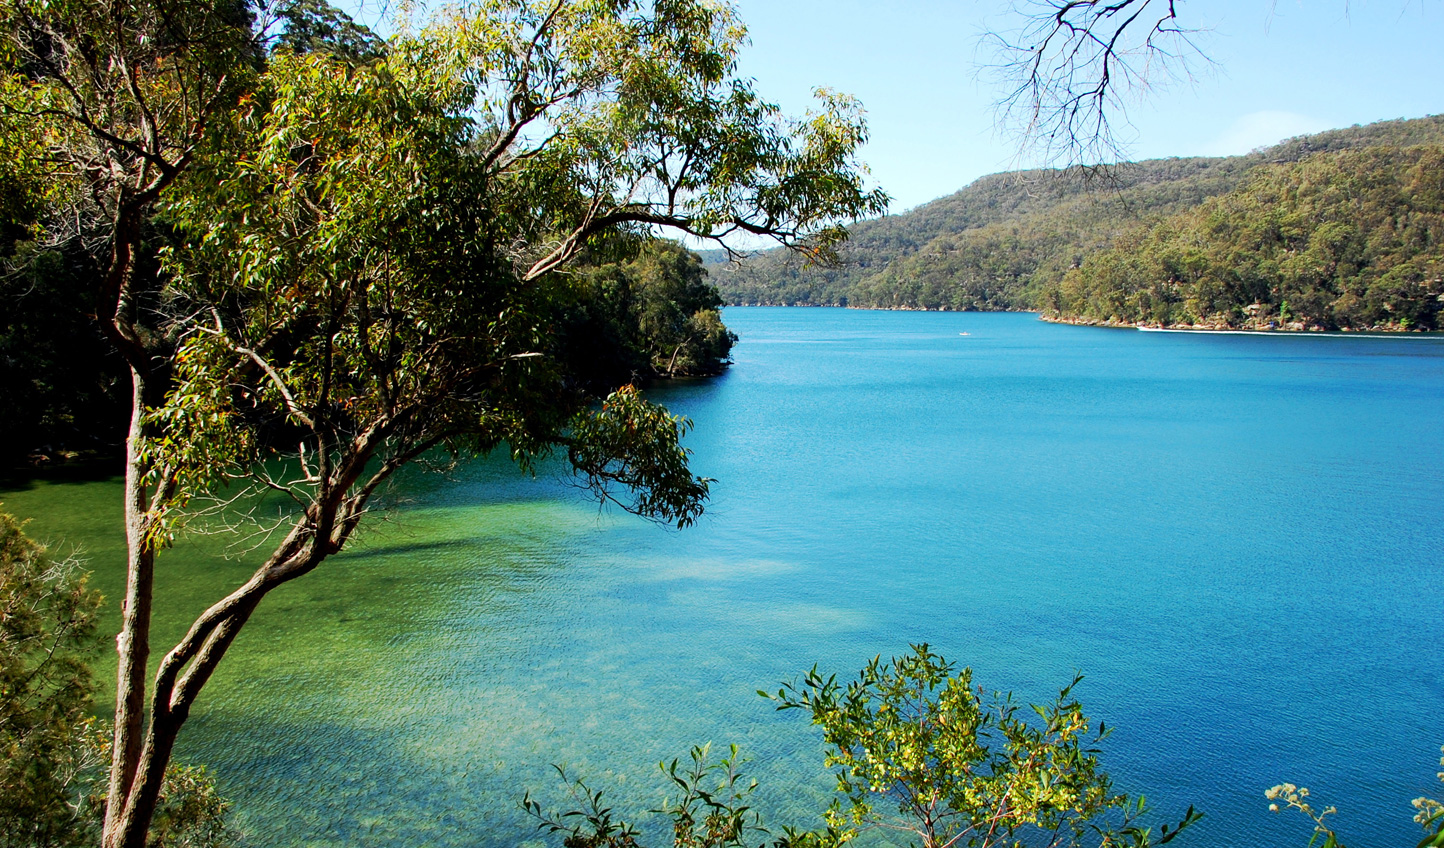 Take in Australia's natural beauty